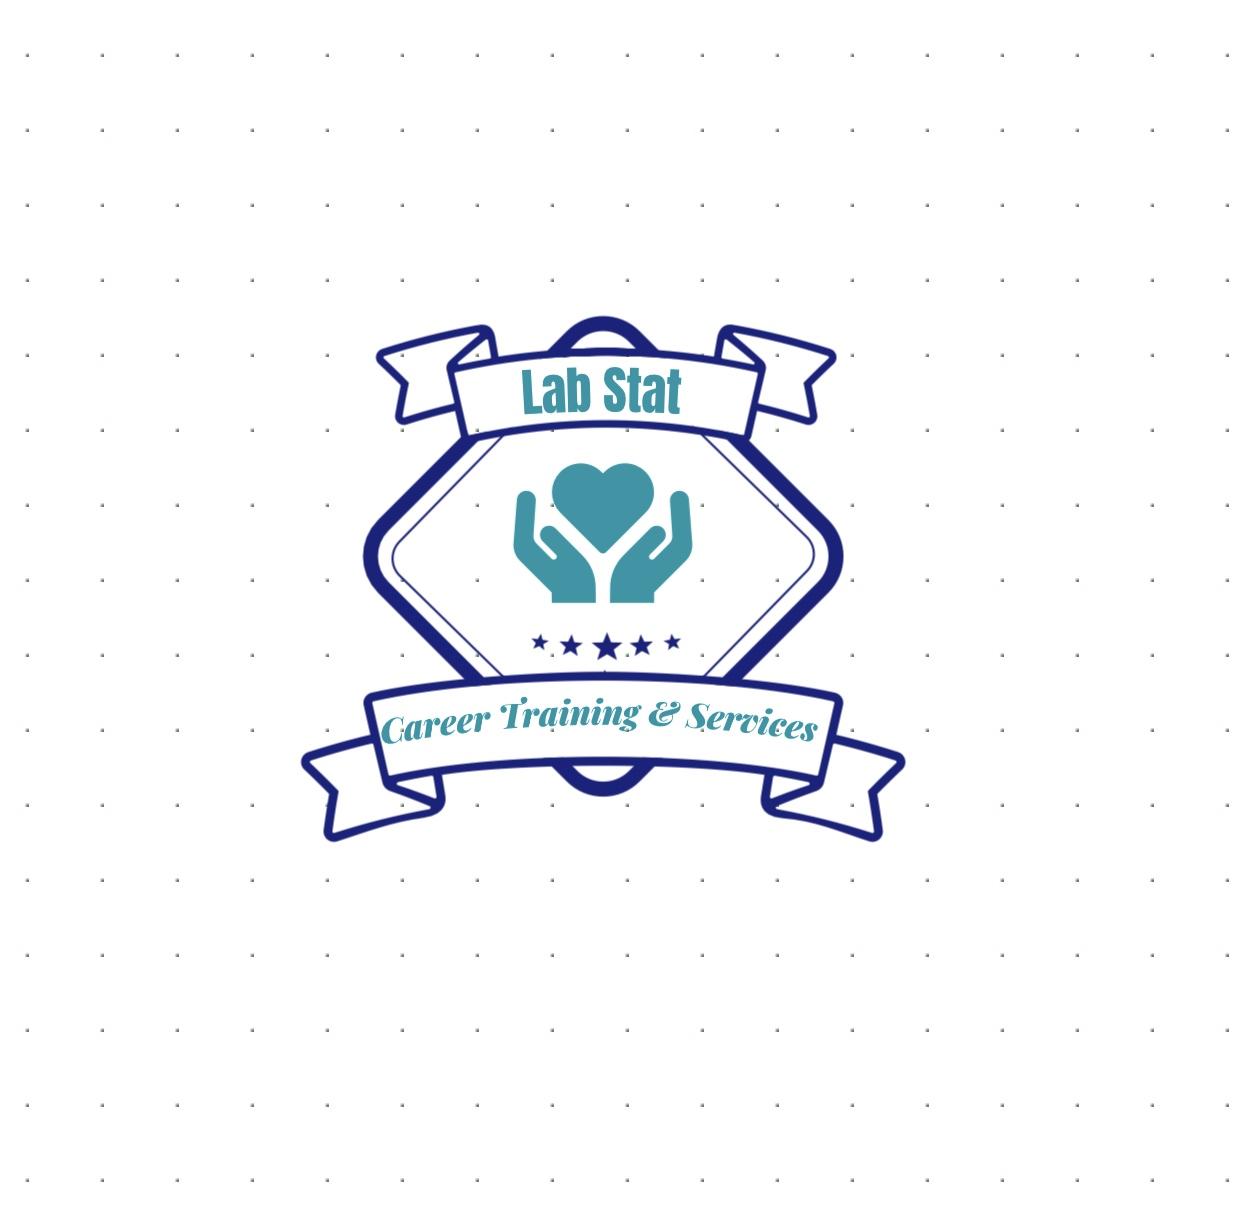 Lab Stat Inc